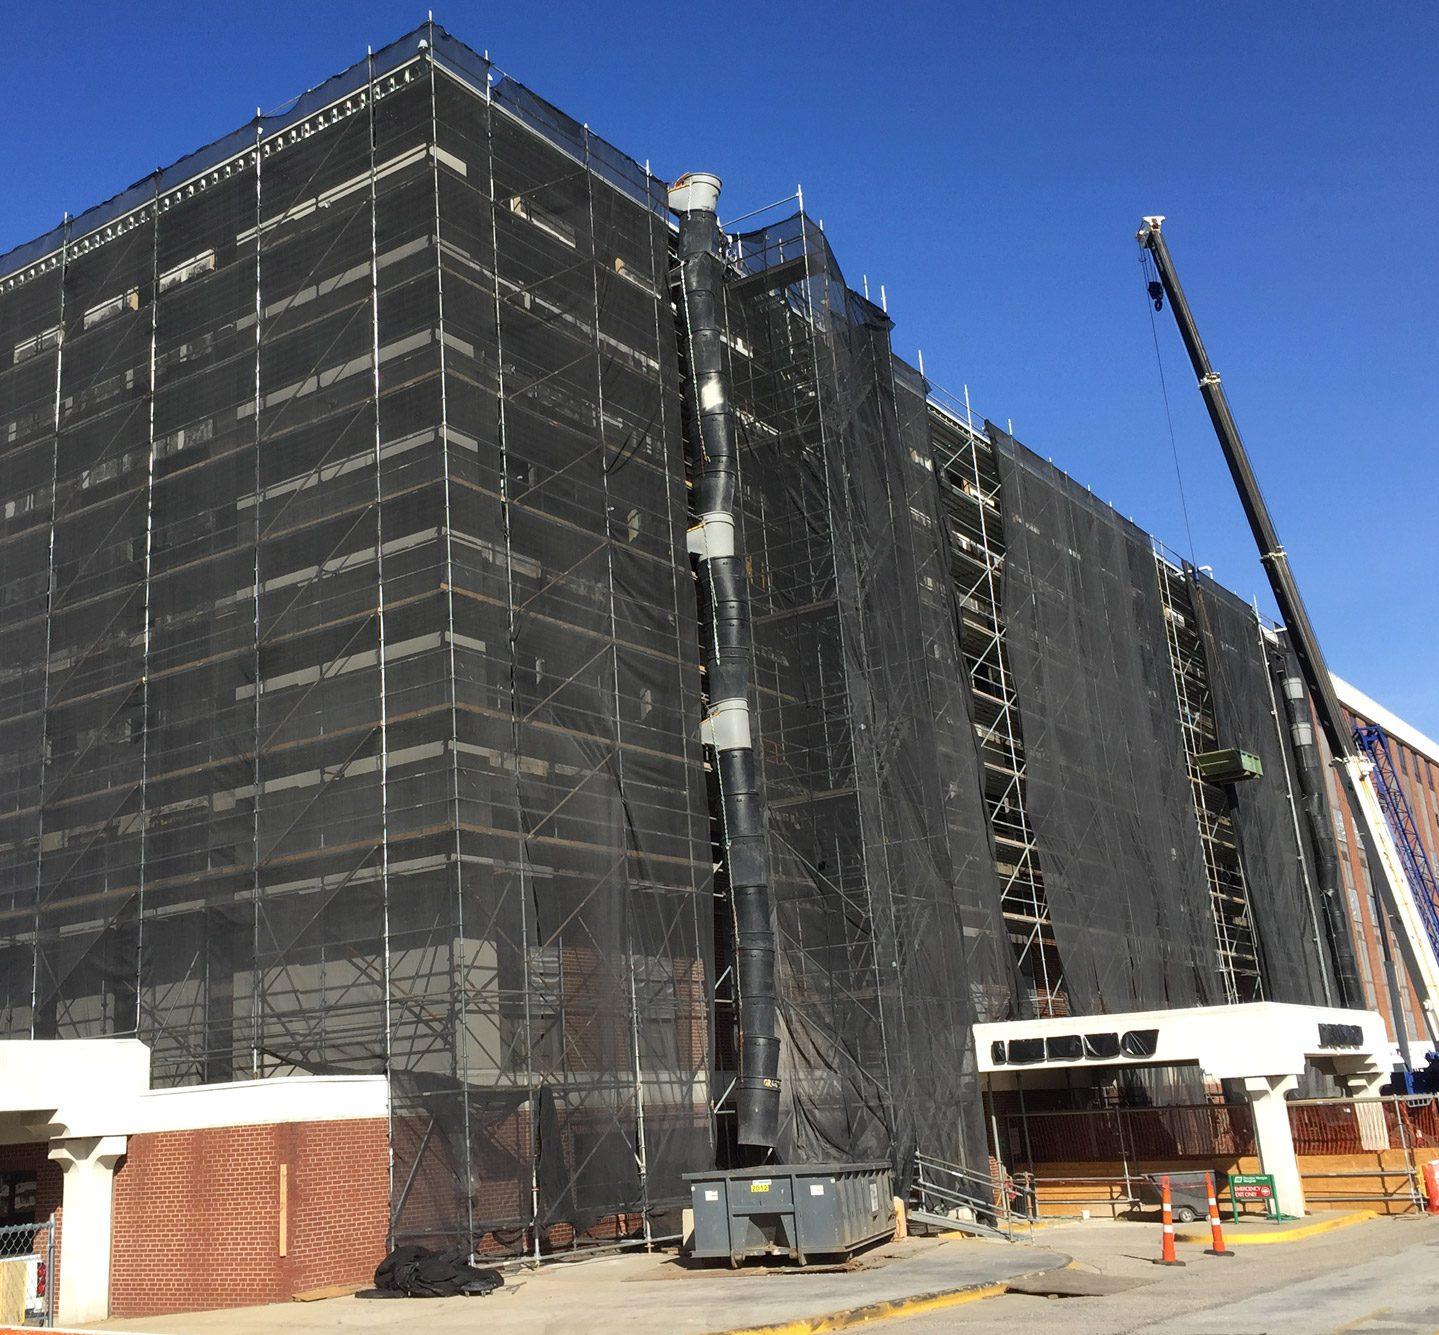 Decatur General Hospital Scaffold Renovation